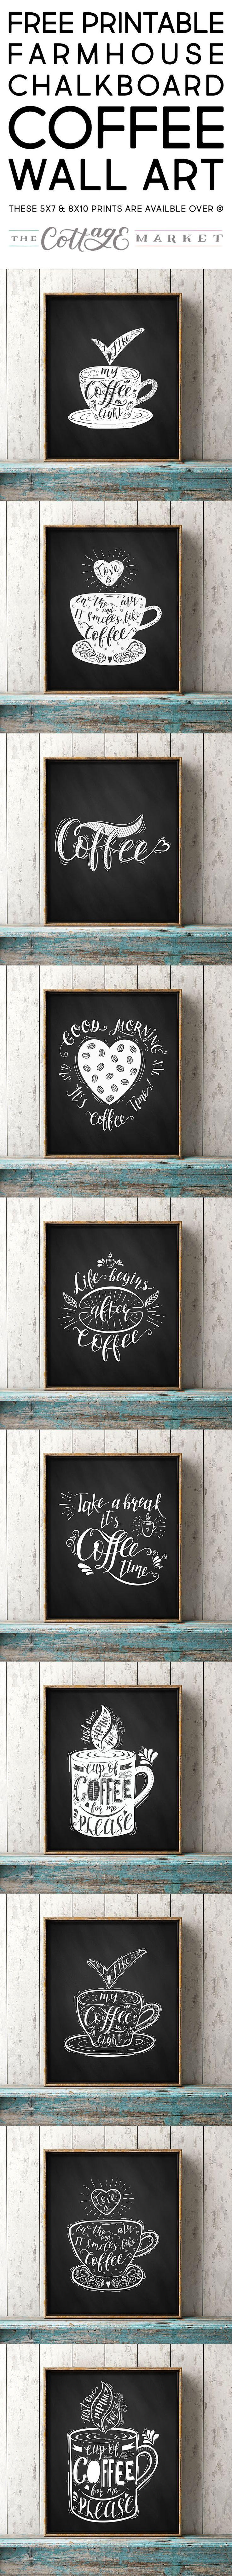 Free Printable Farmhouse Chalkboard Coffee Wall Art